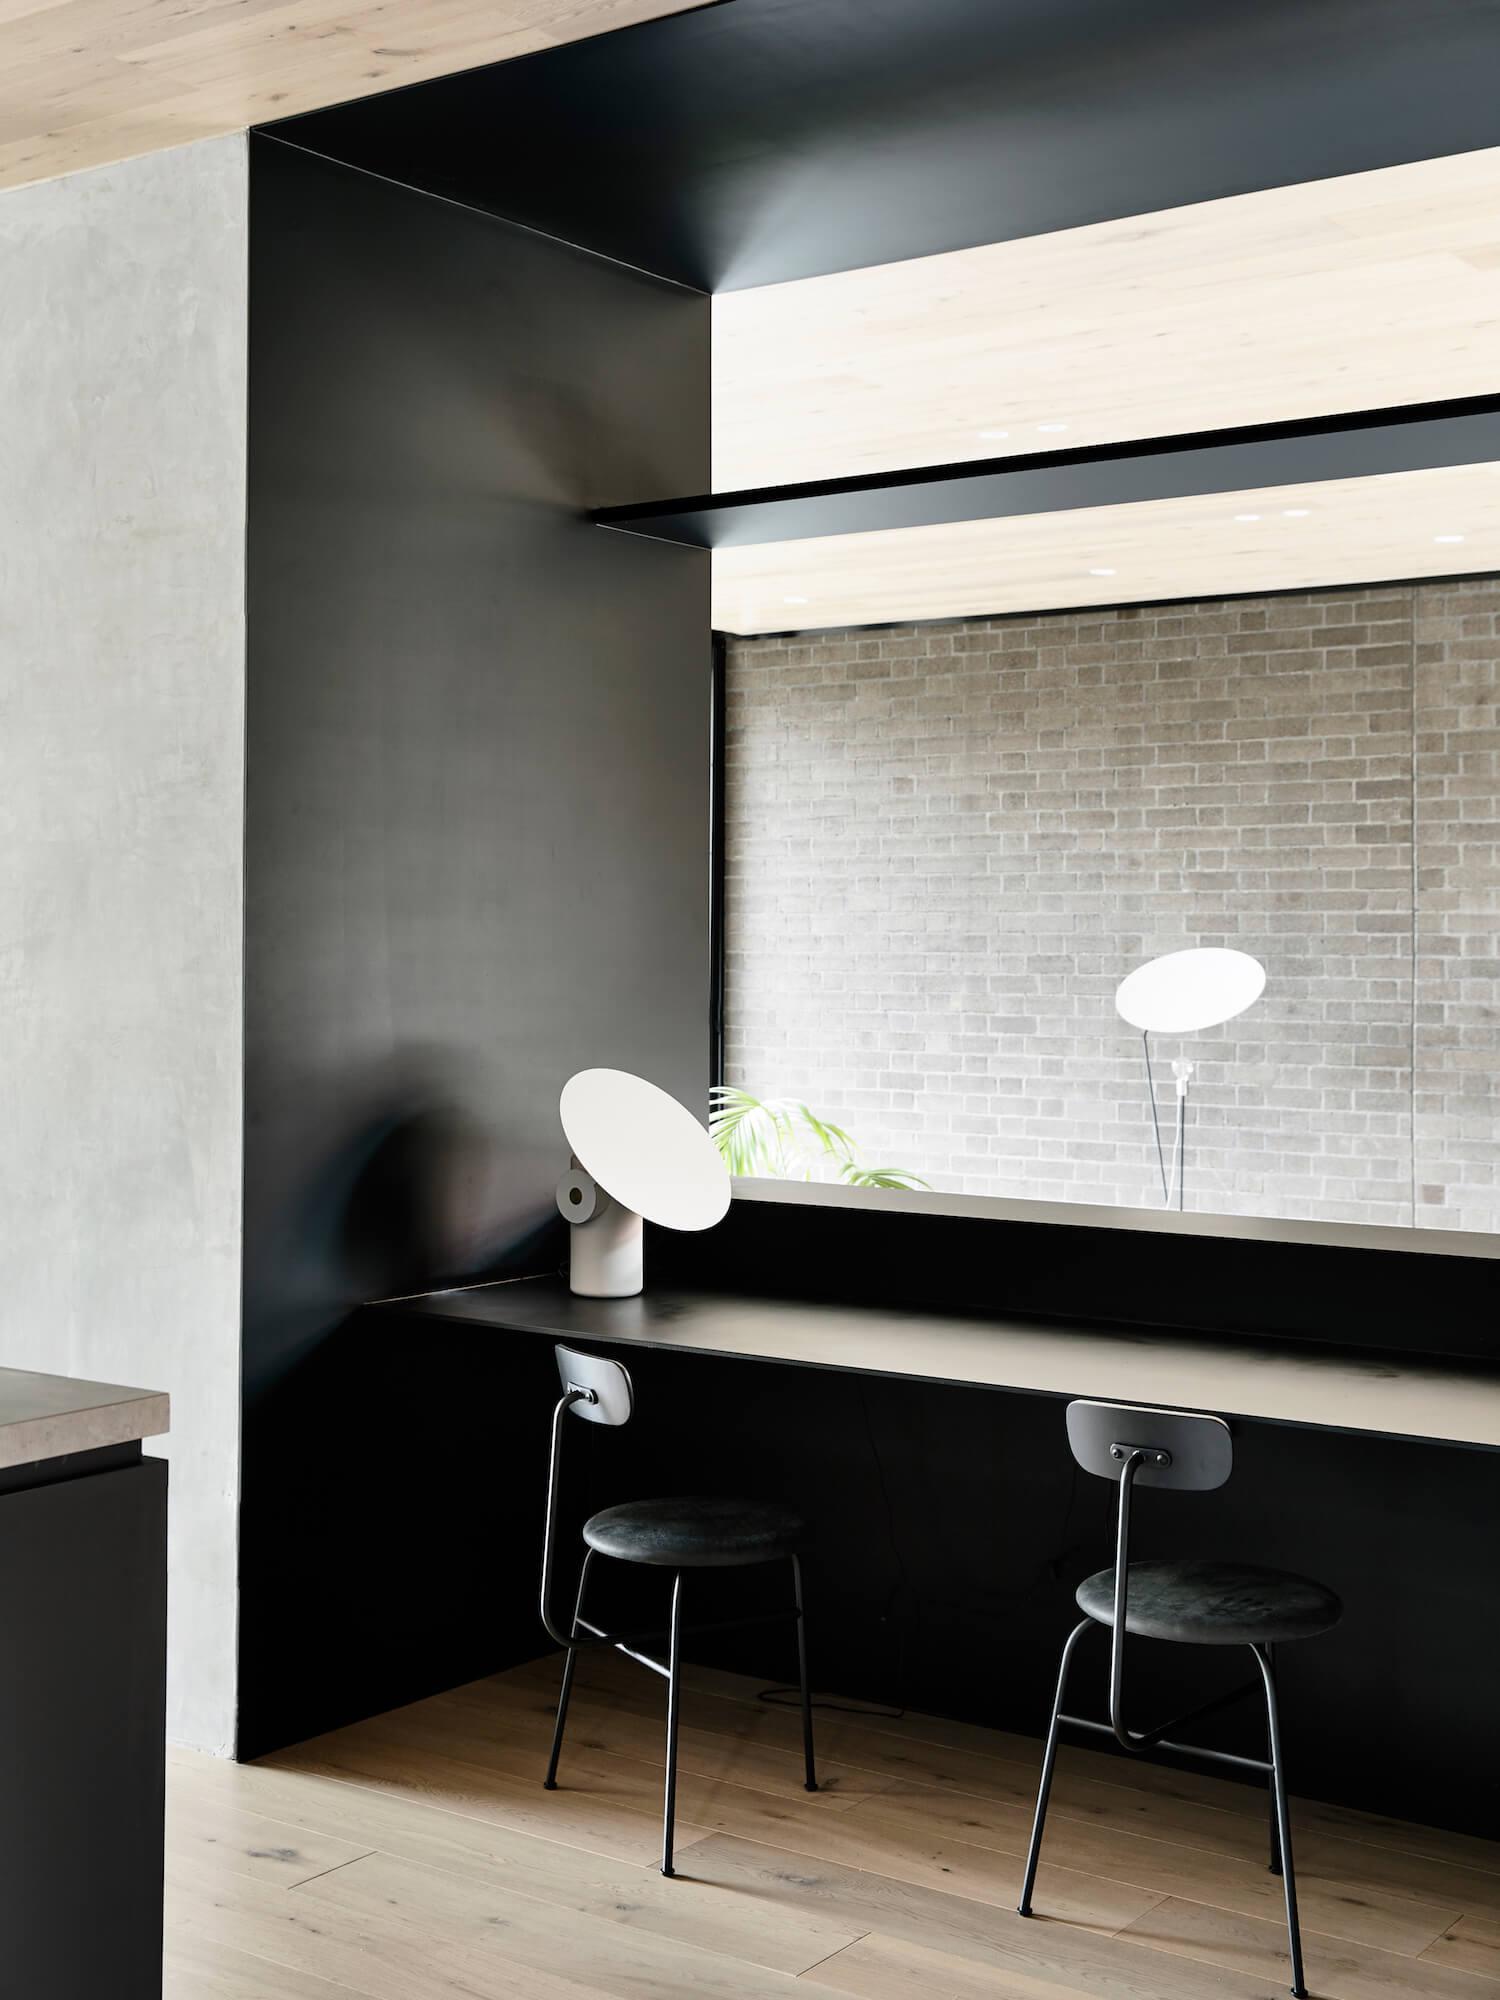 est living york street residence jackson clements burrows architects brickworks 16